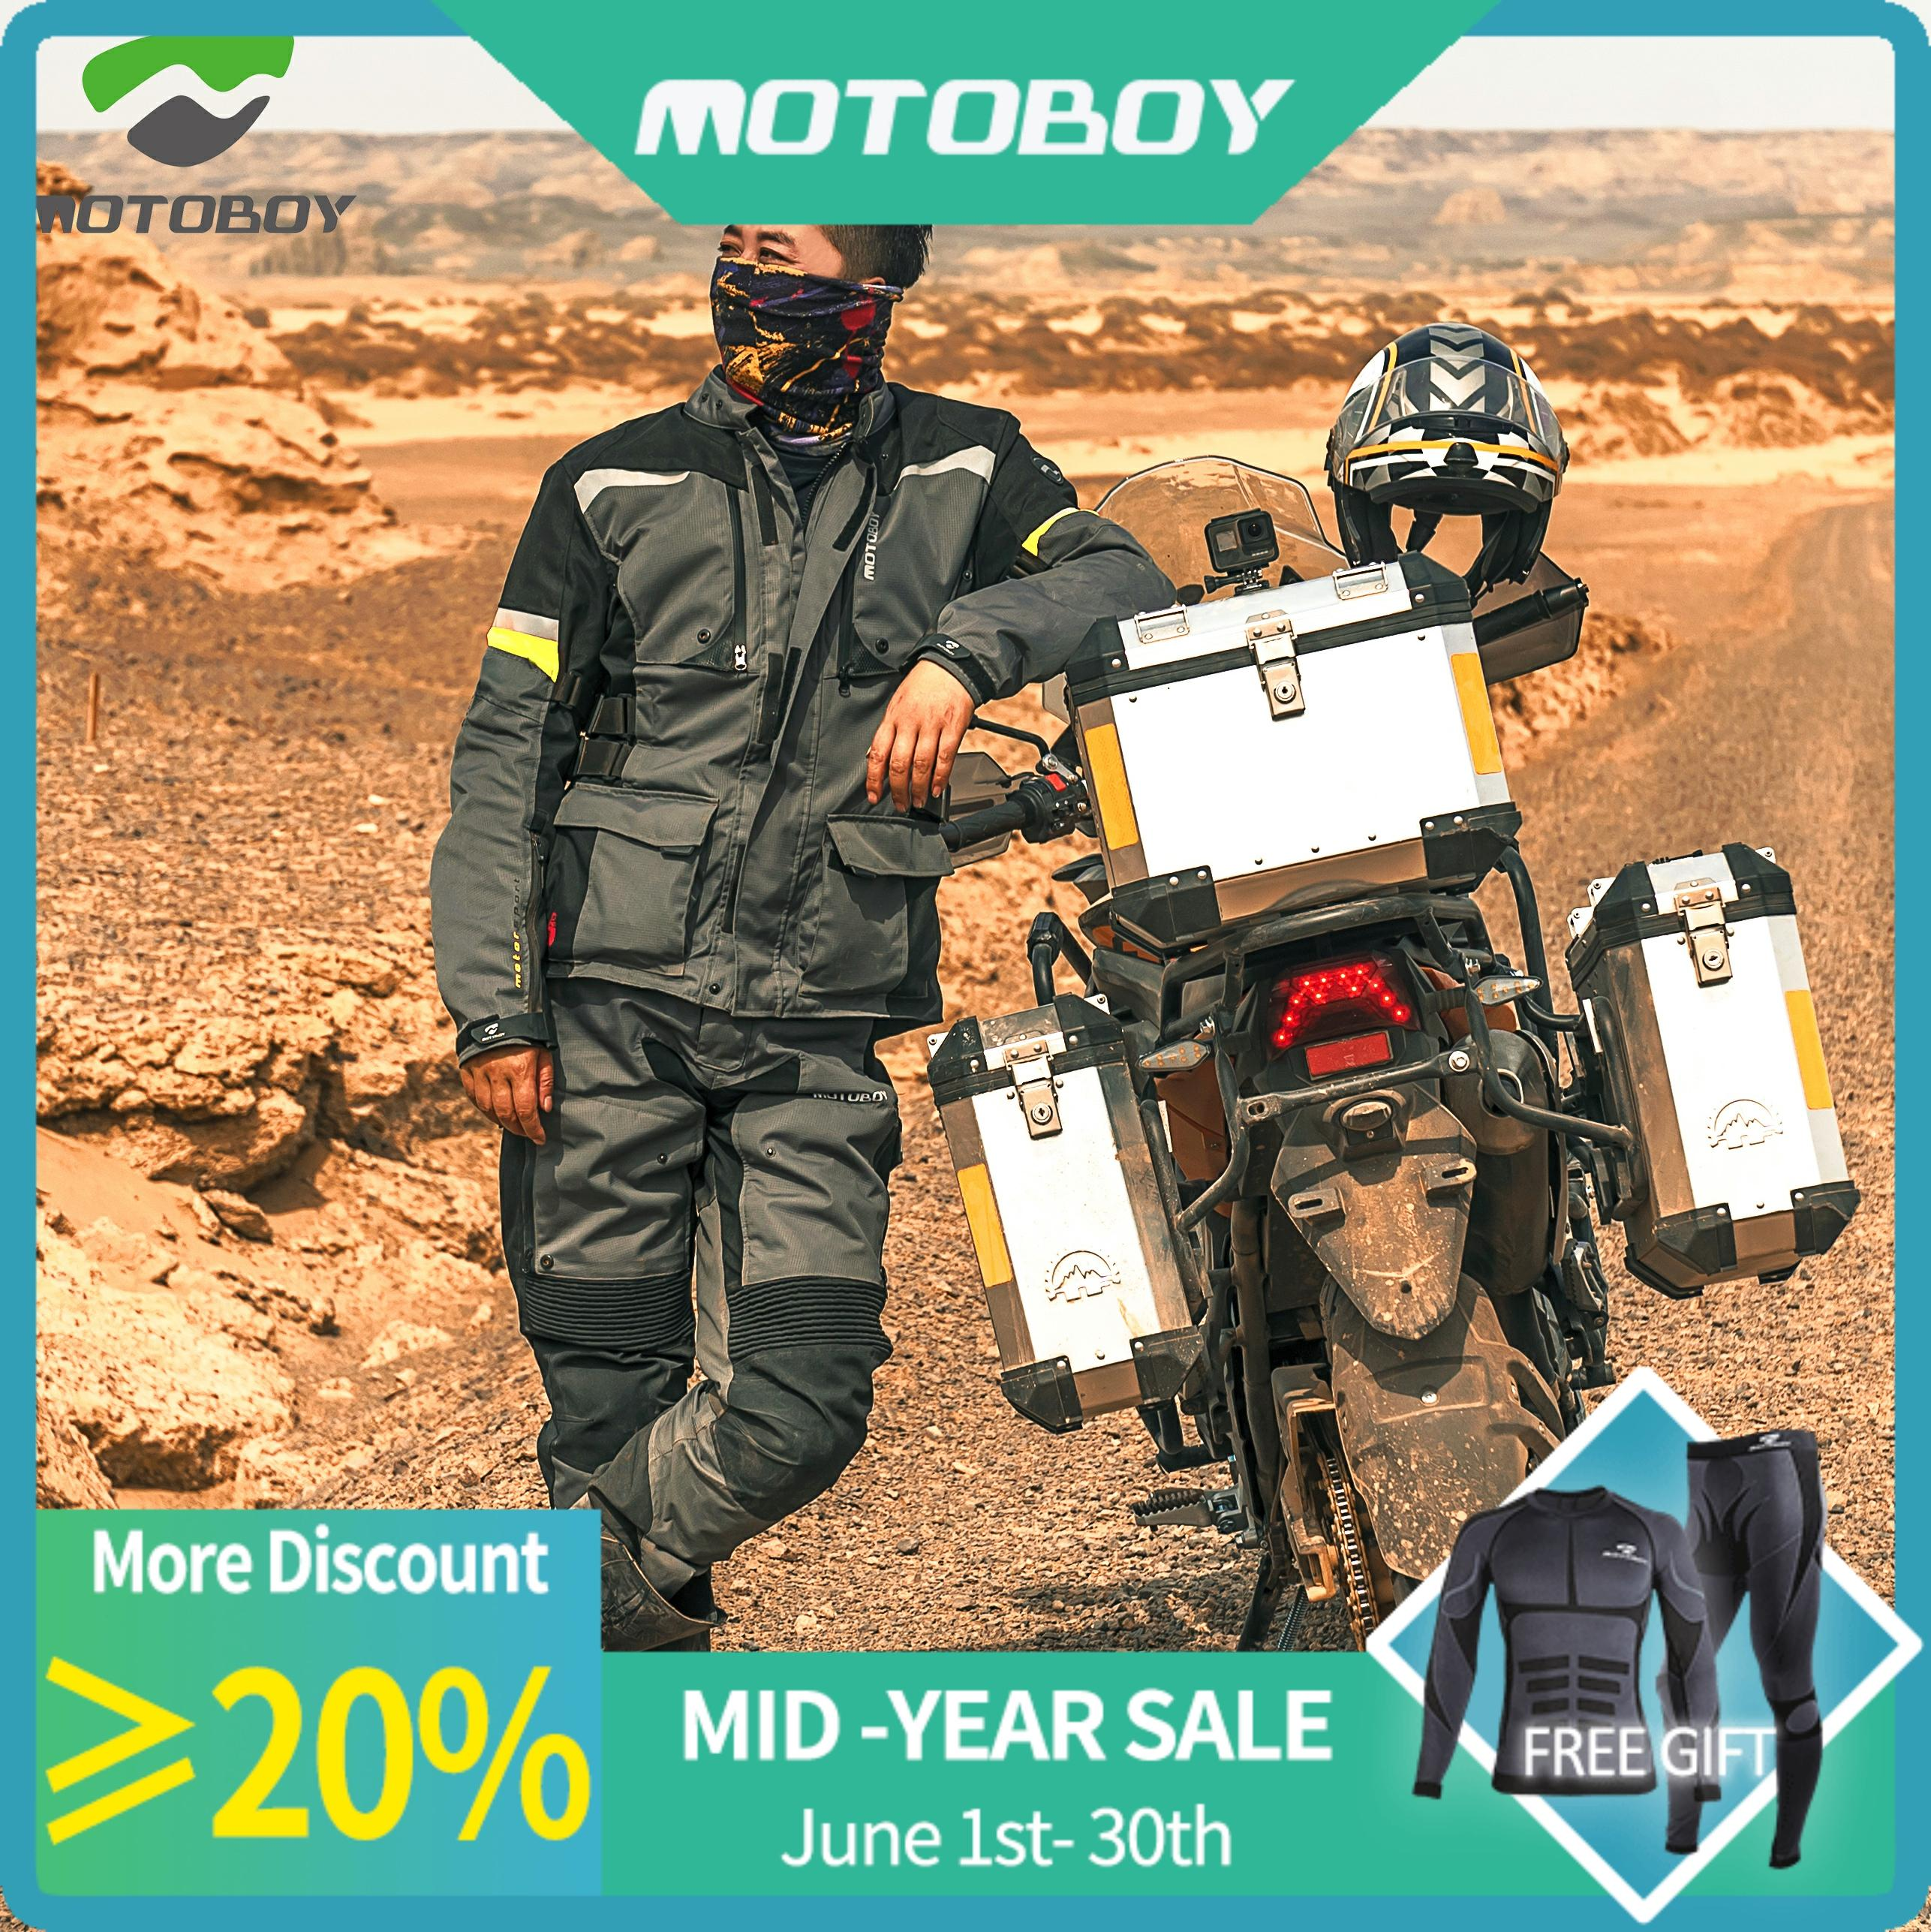 New Motoboy Motorcycle Bike Polyester 600D Oxford Riding Touring 3 Layer Waterproof Warm Jacket&Pant 4 Season Wear CE Protectors